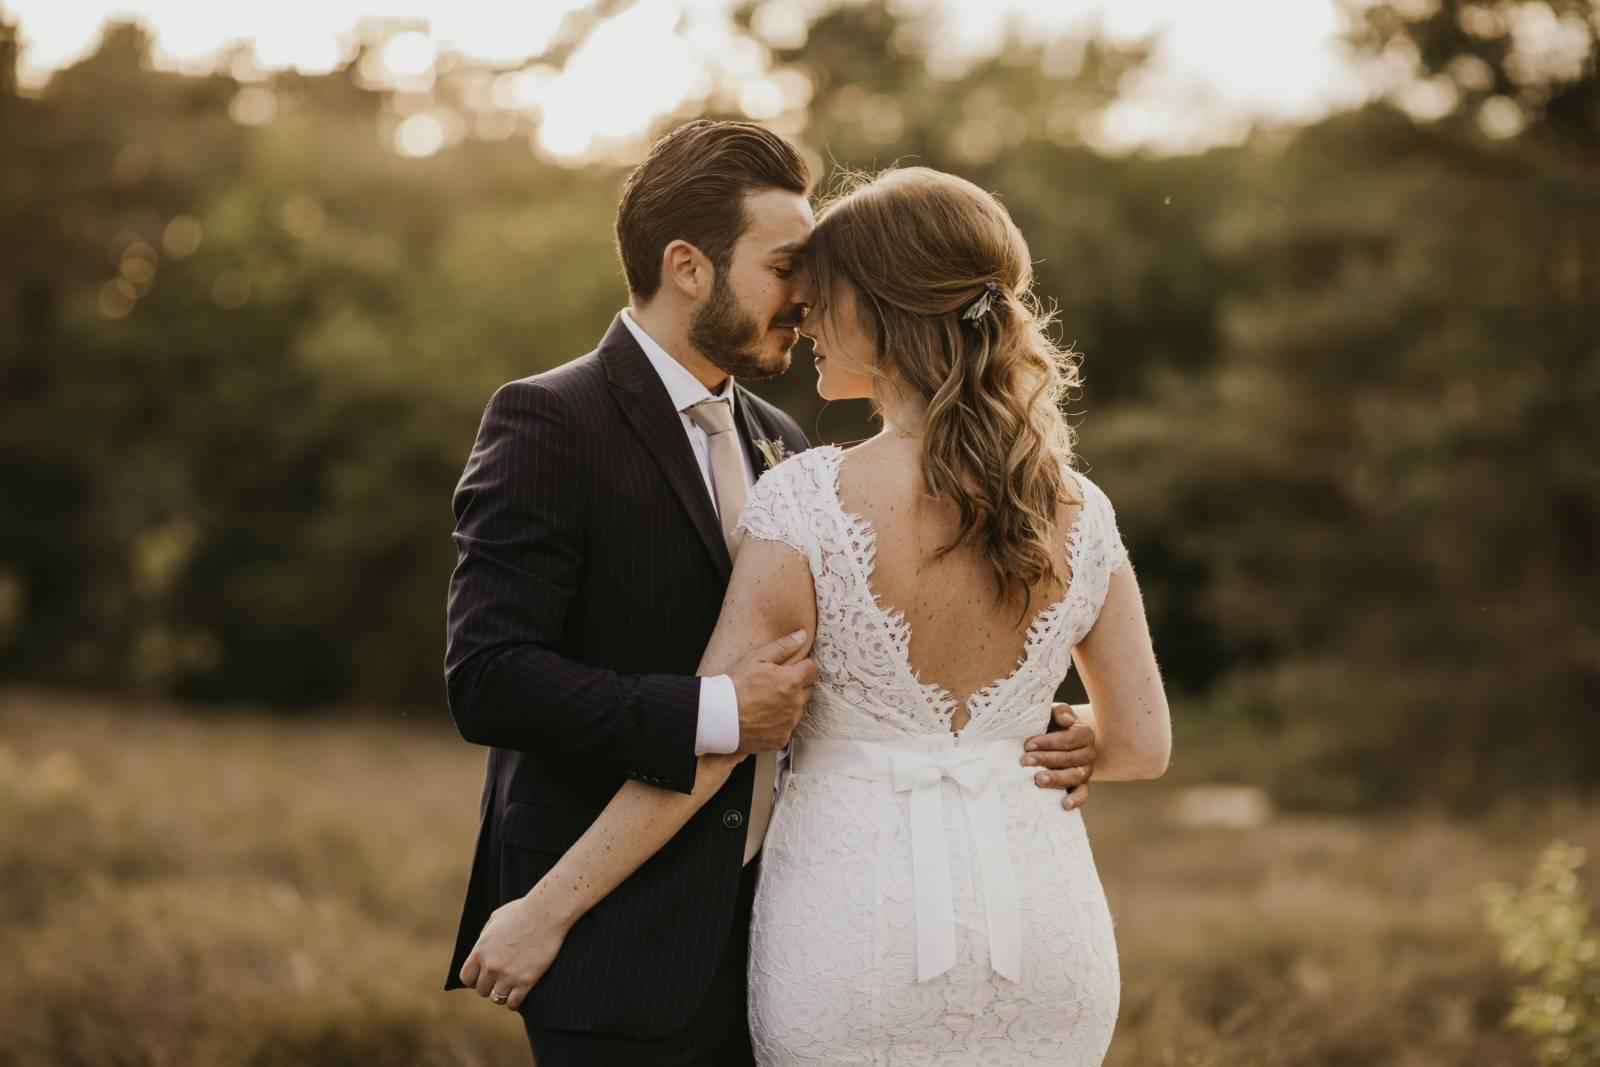 Imperish Photography - Fotograaf Silke - House of Weddings (20)